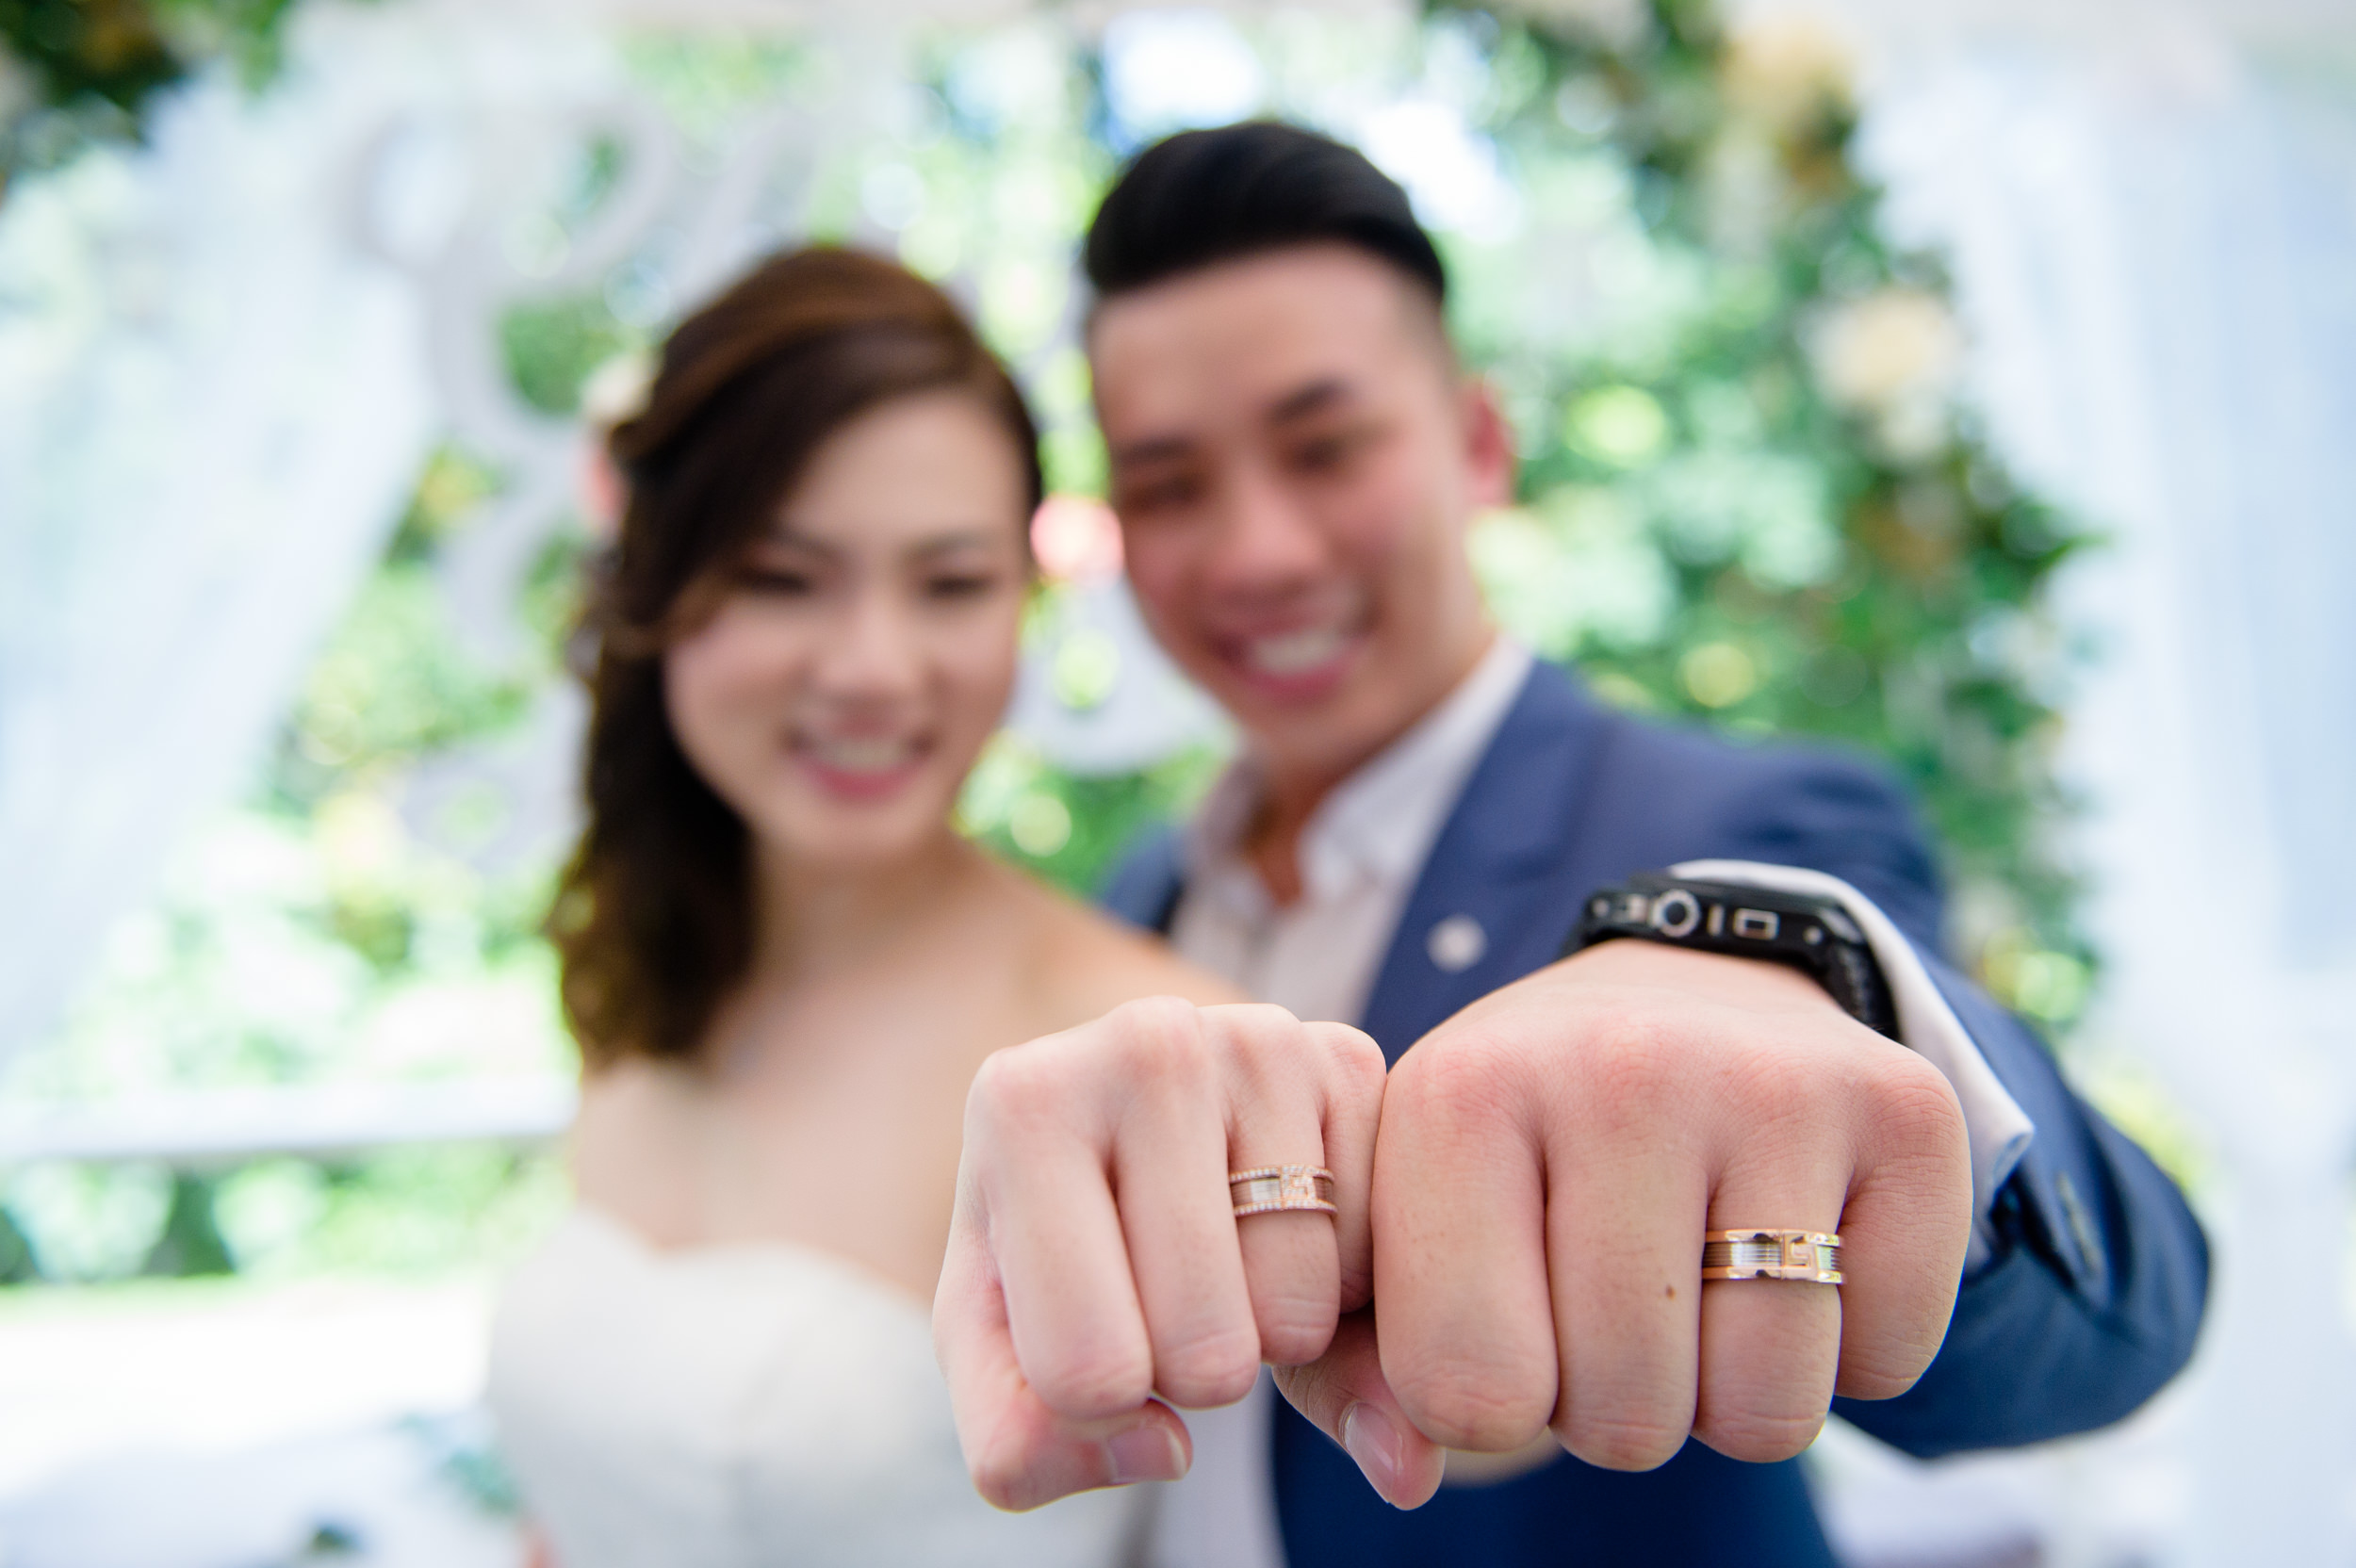 ROM wedding ring photo